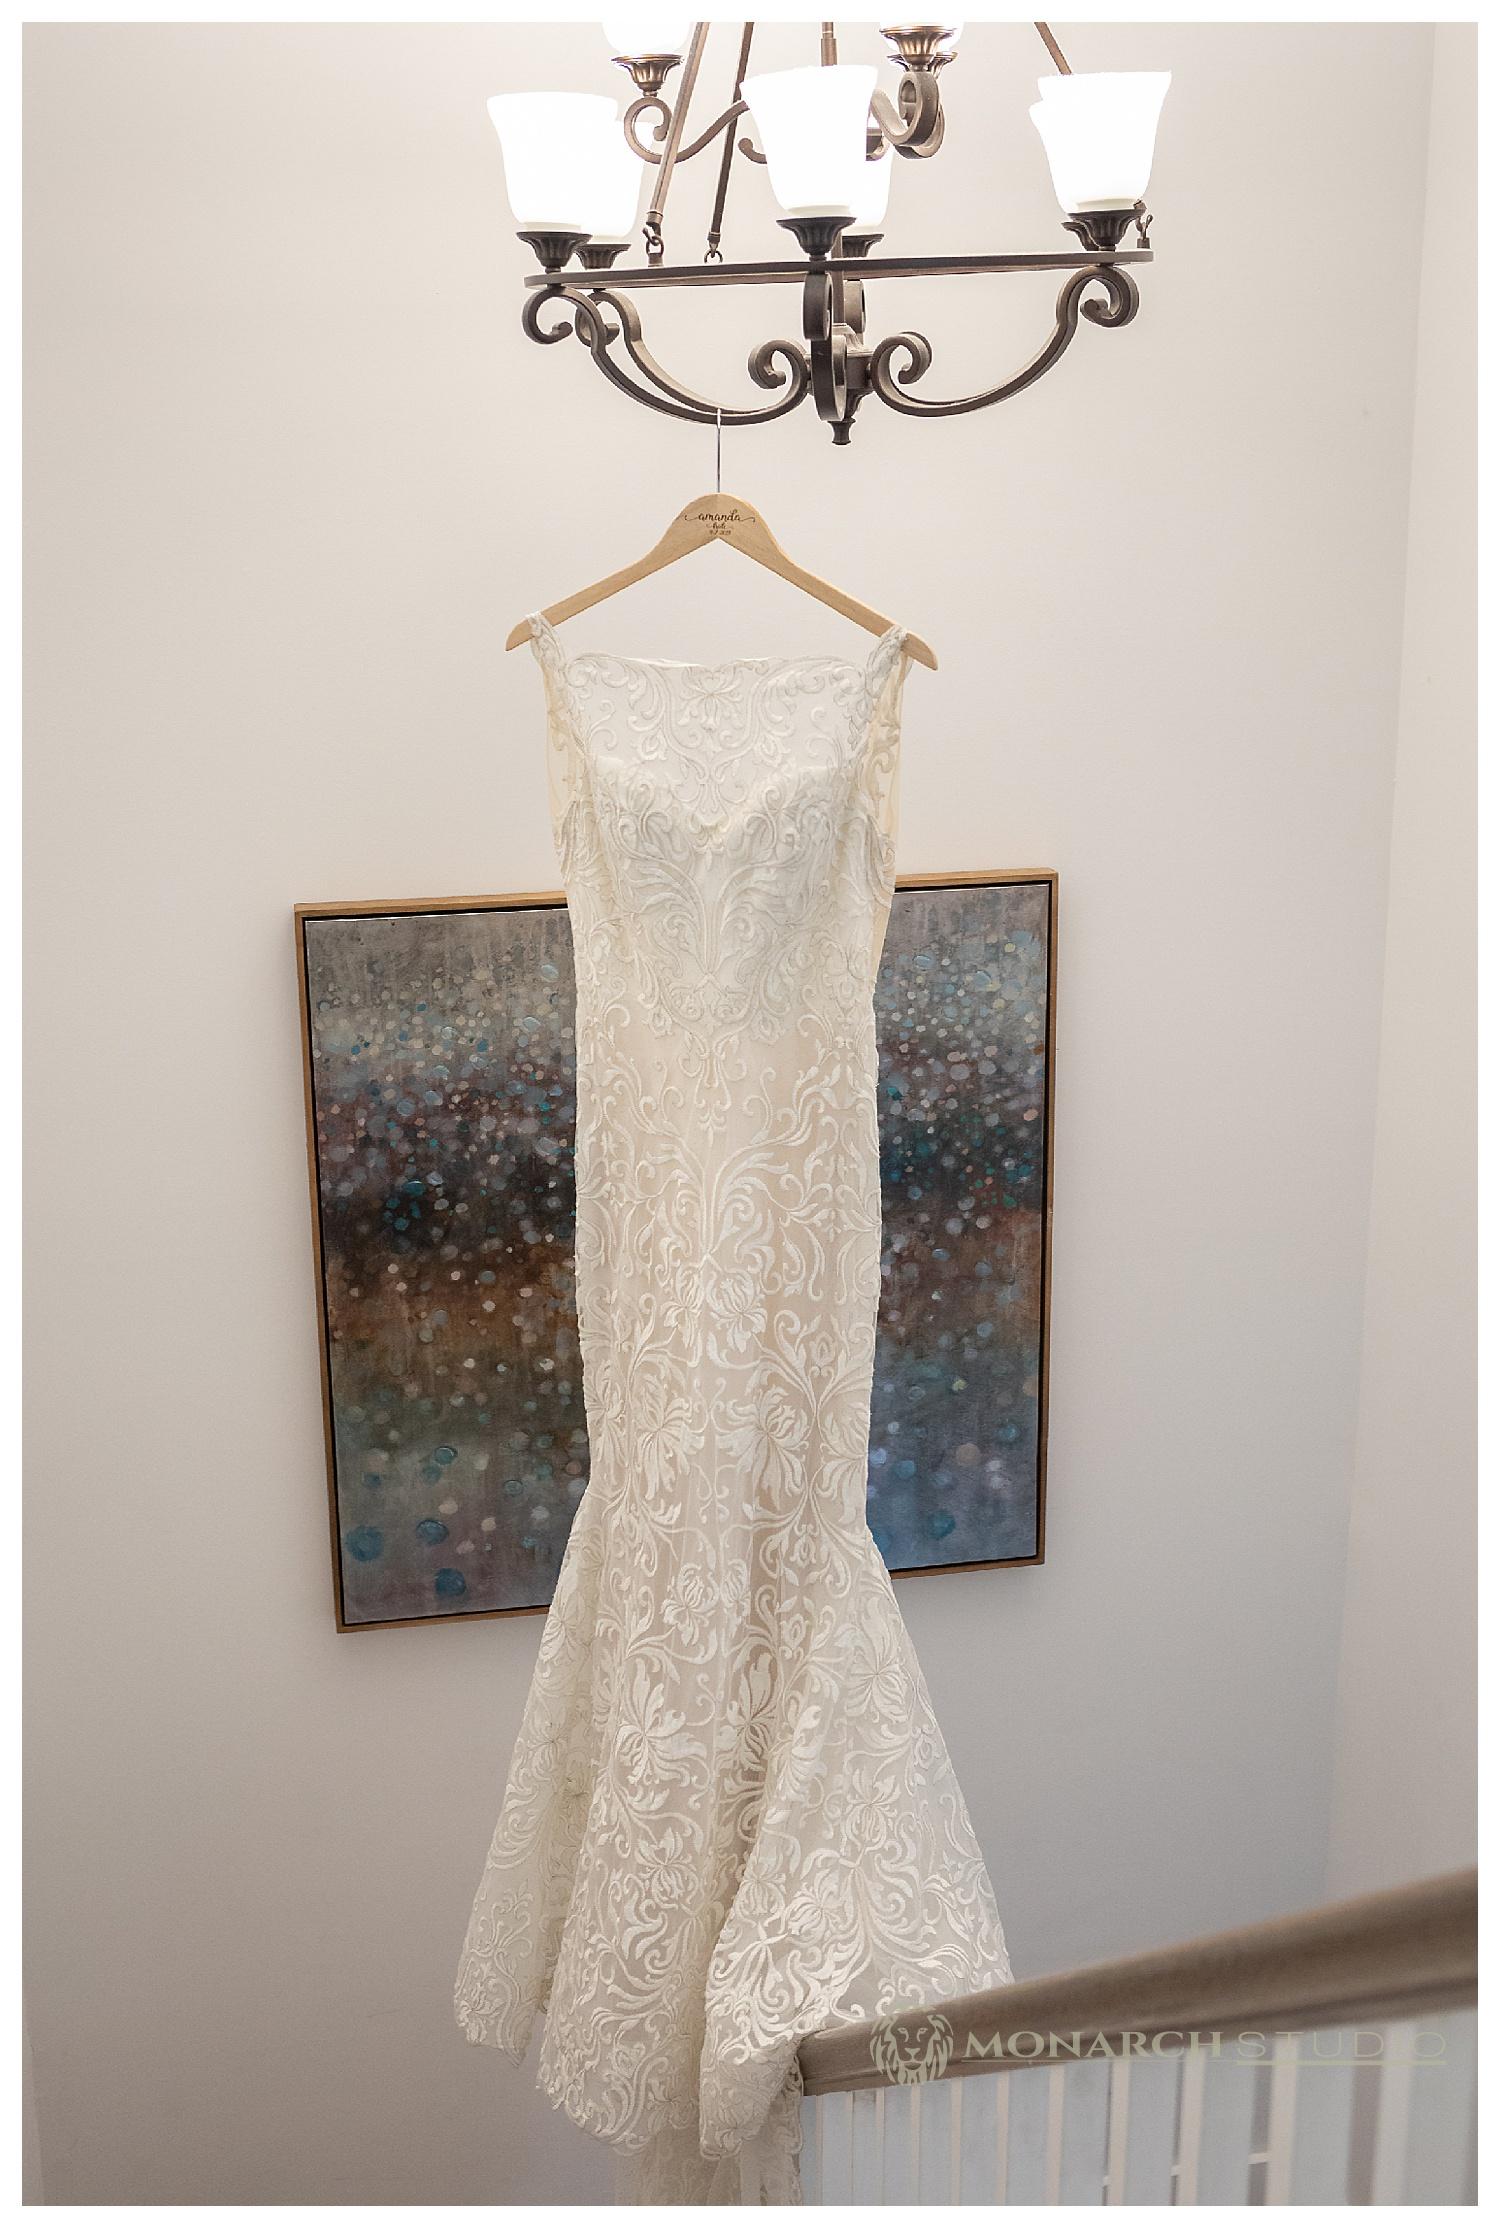 St. Augustine Wedding - Amore Wedding Chapel - 010.JPG